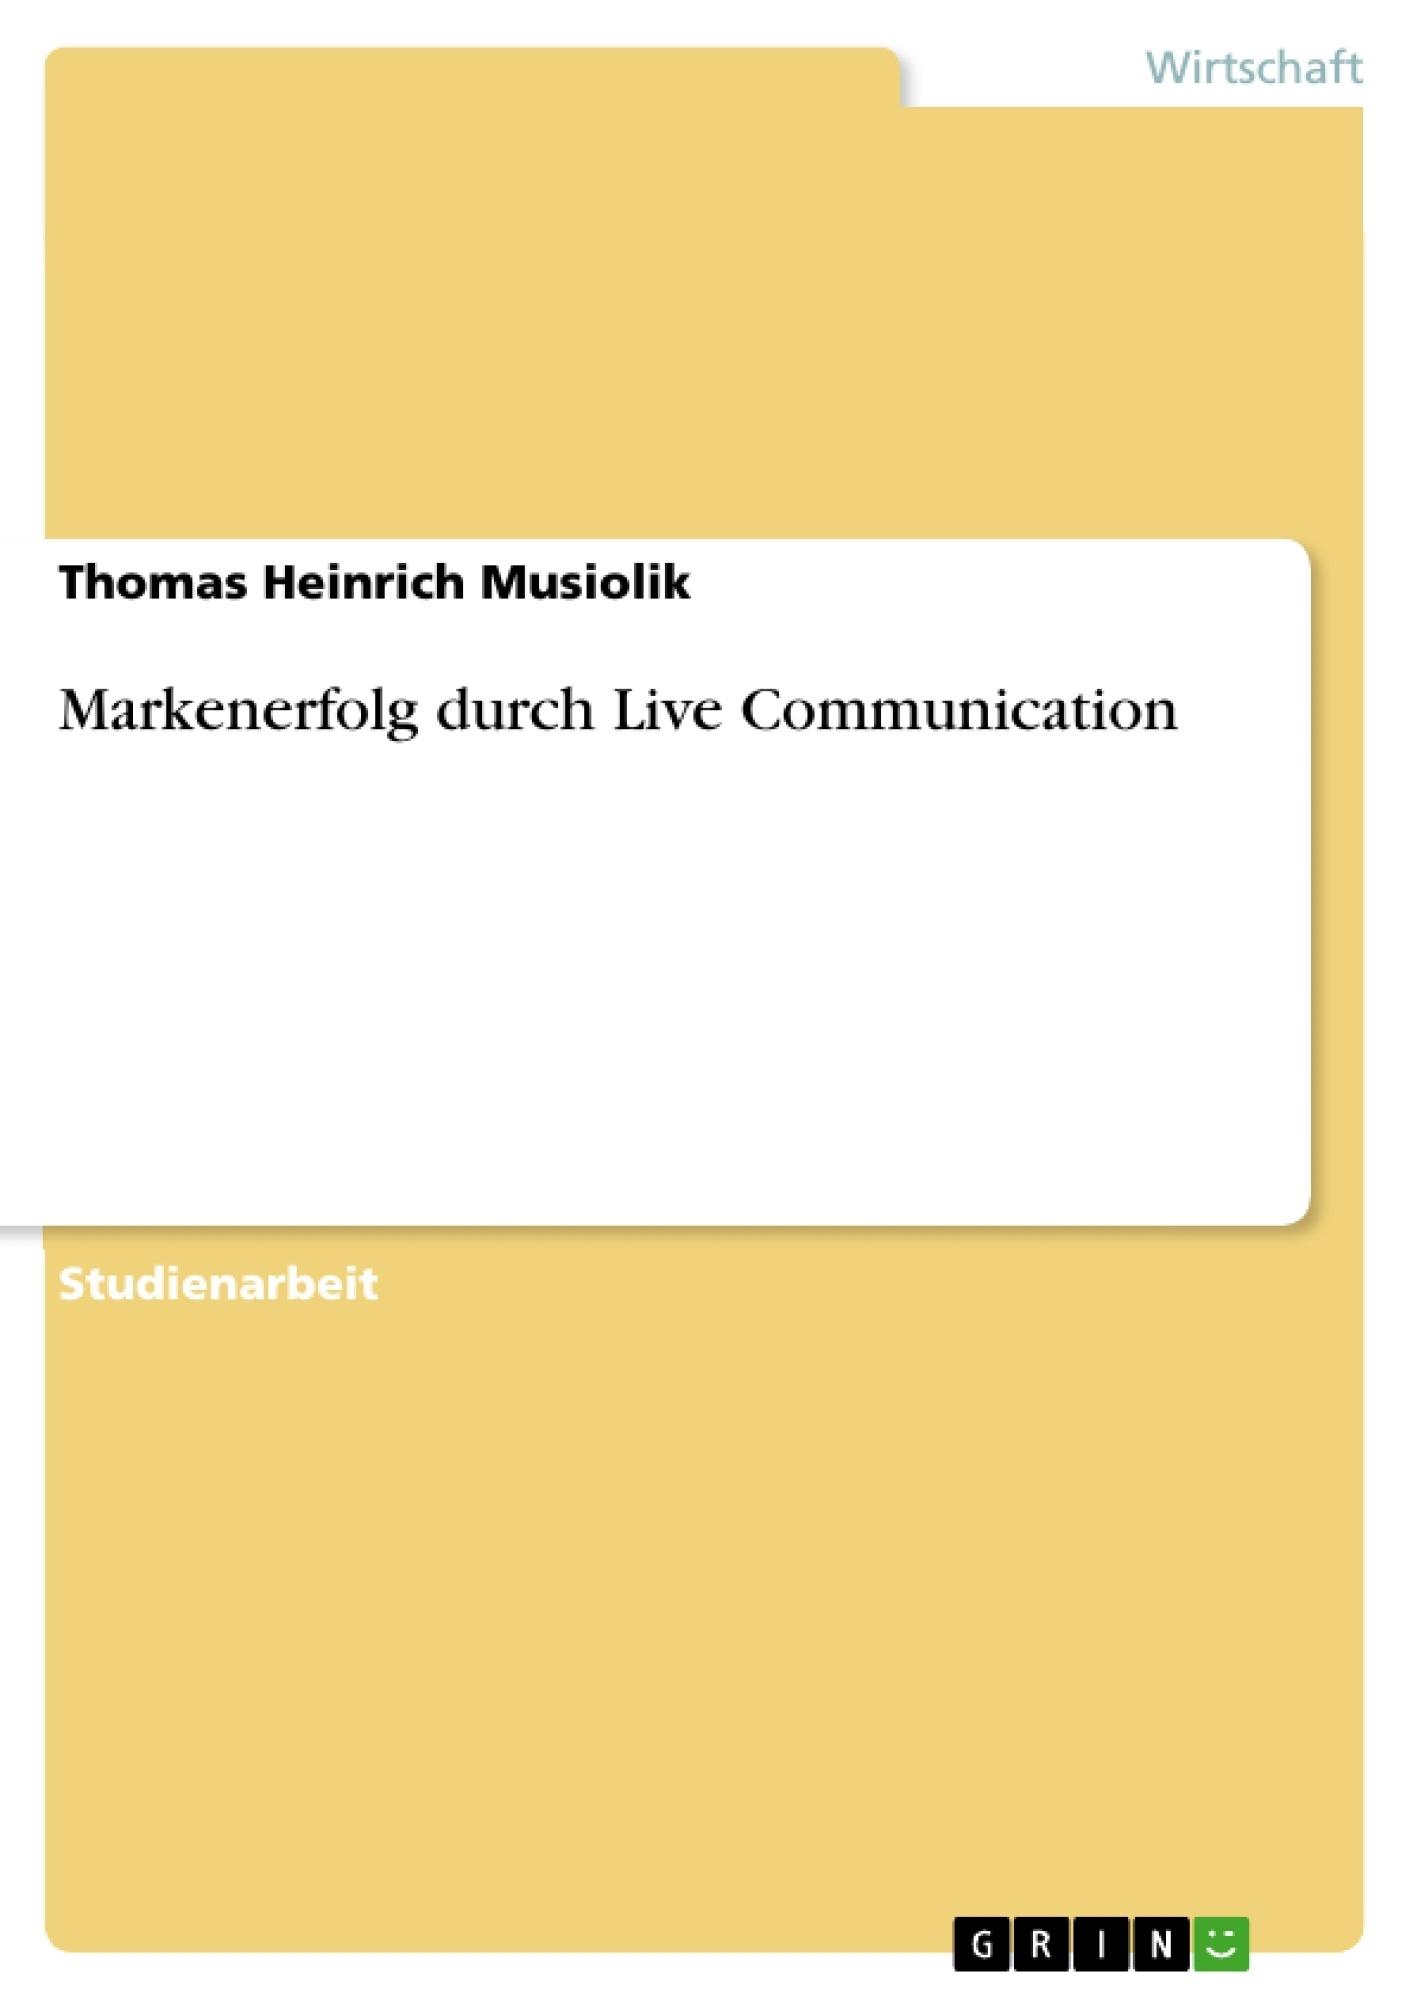 Titel: Markenerfolg durch Live Communication